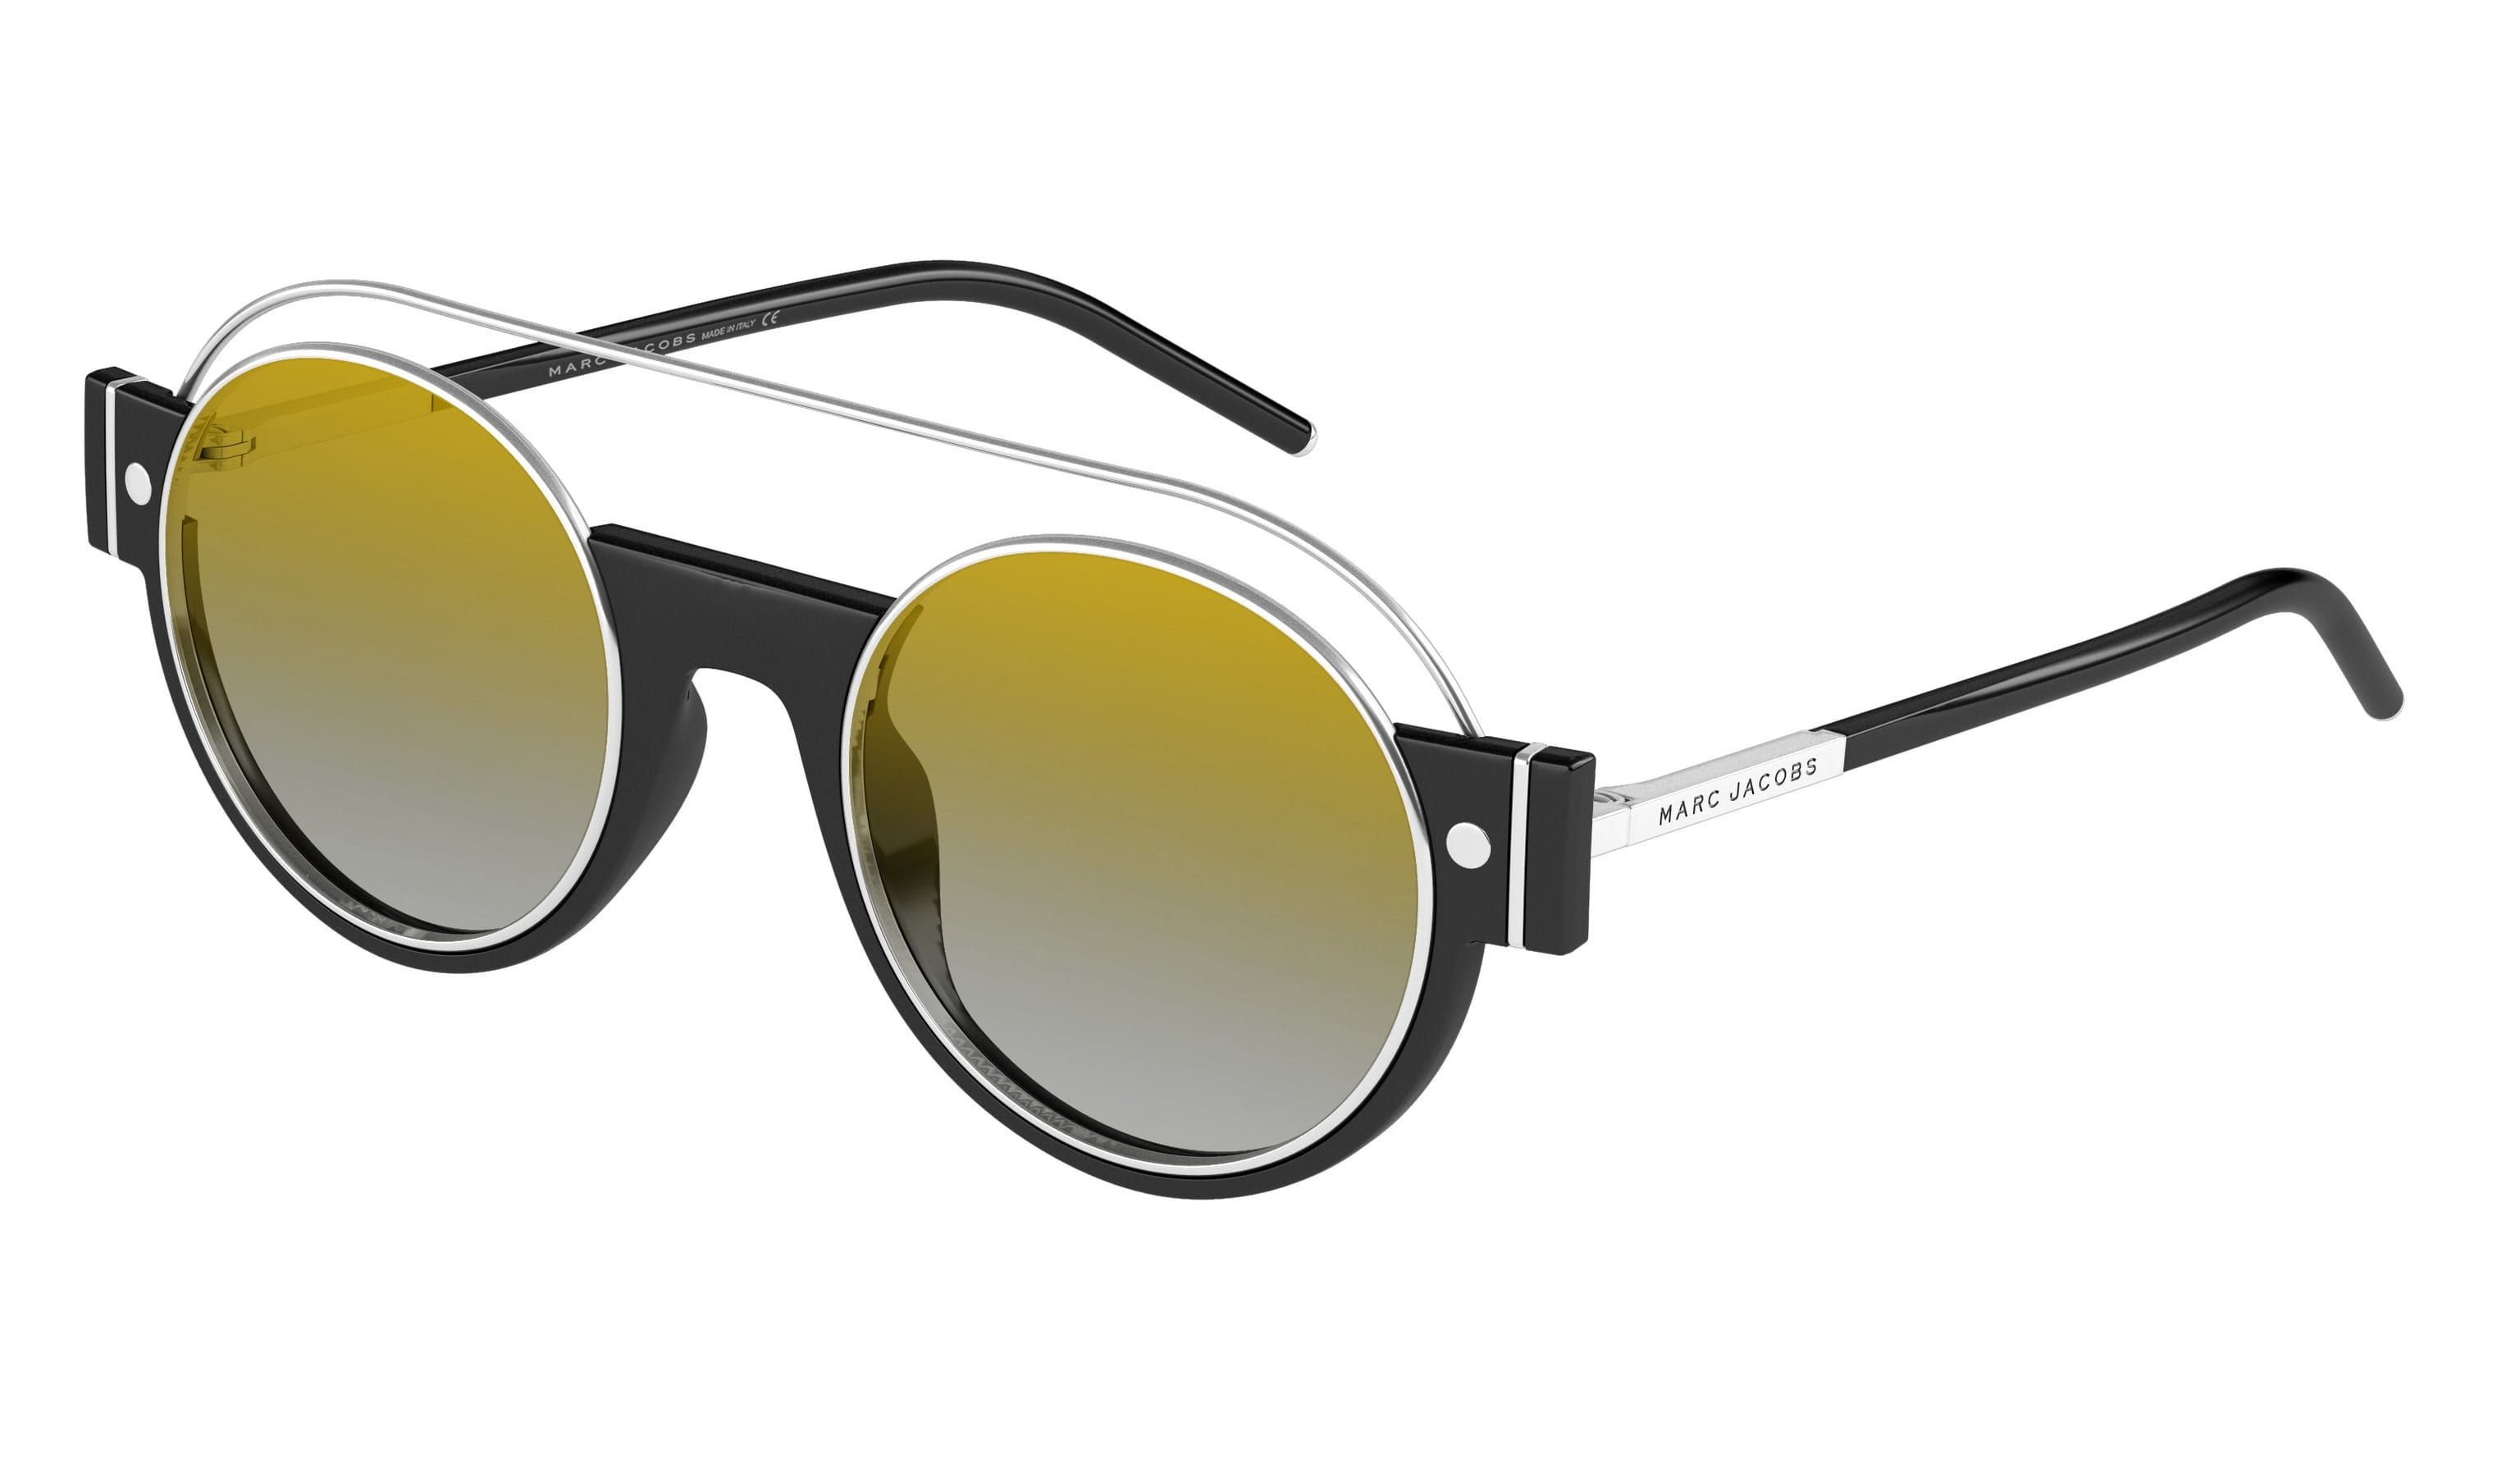 81c386f2da Marc Jacobs   Συλλογή γυαλιών άνοιξη καλοκαίρι 2016 - Efthimis is around